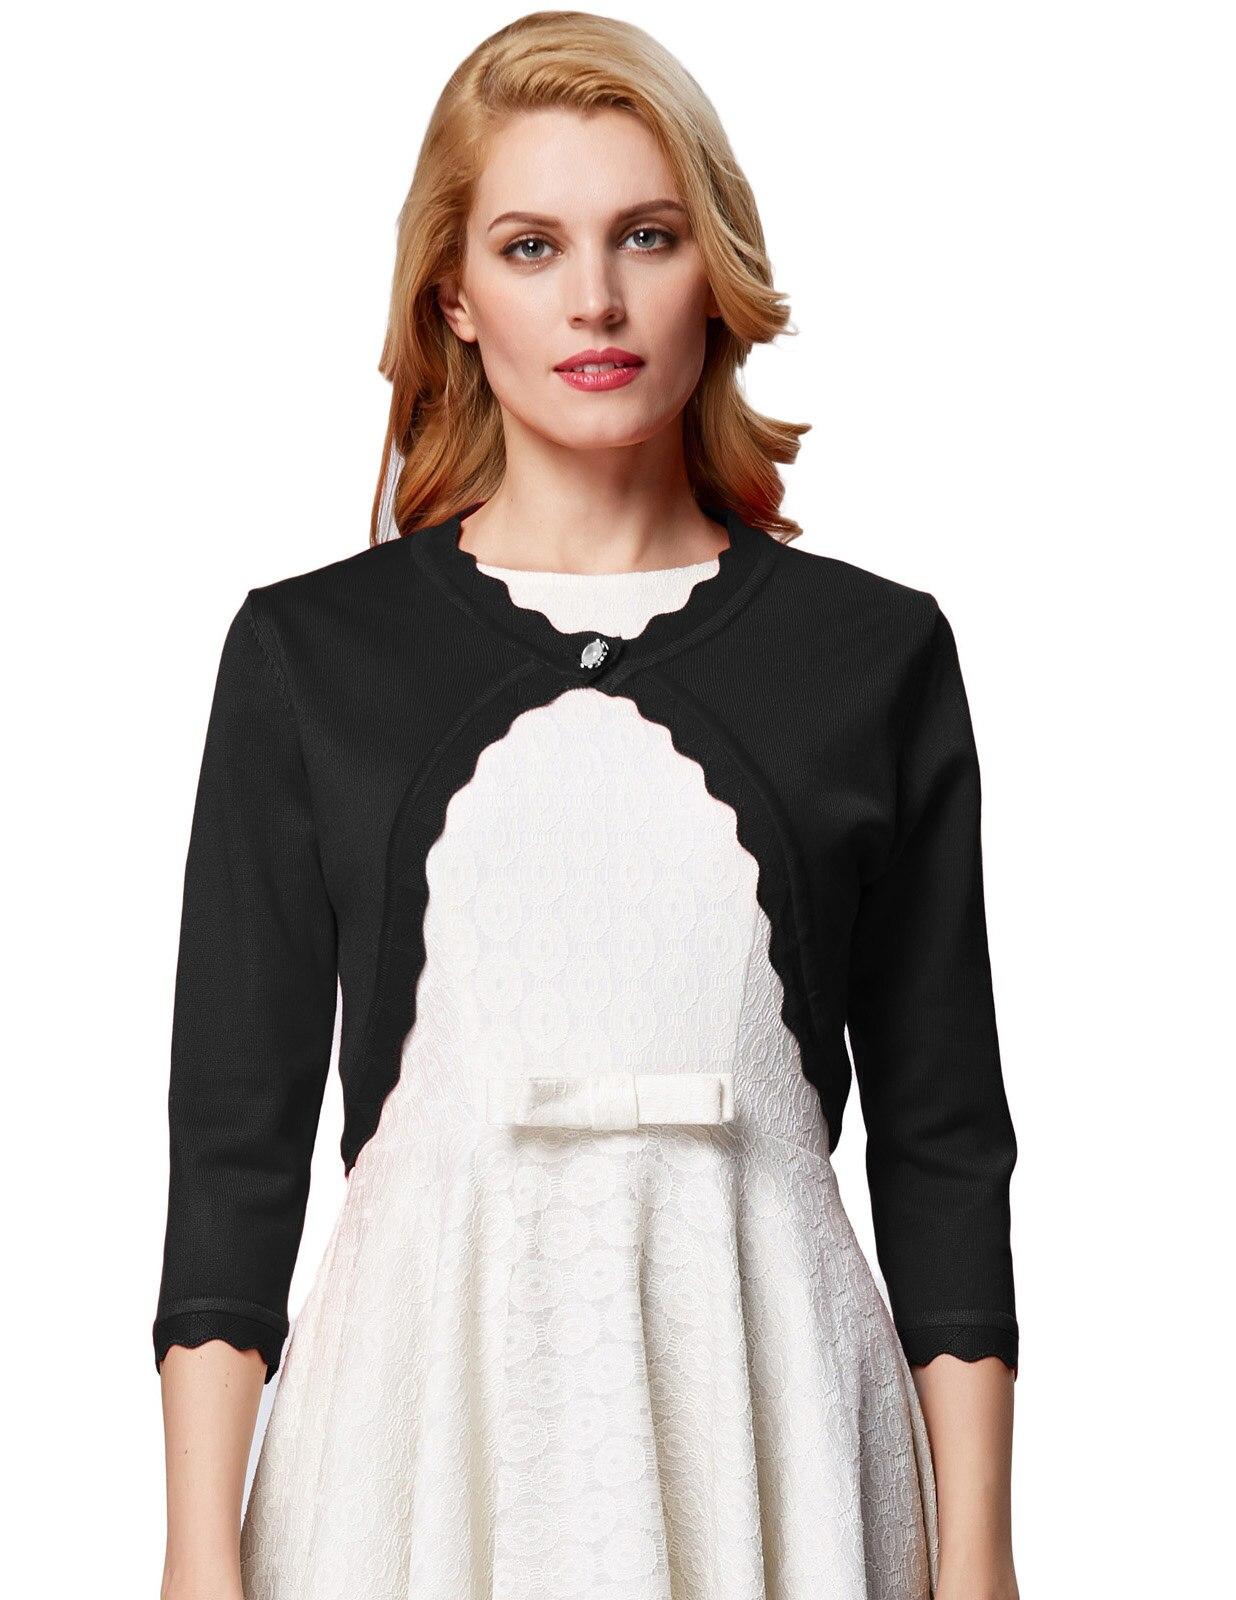 Women Coats Casual Lightweight Knitting Sweater Trim 3/4 Sleeve One Button Knitting Bolero Shrug 2019 Women Coat Jacket